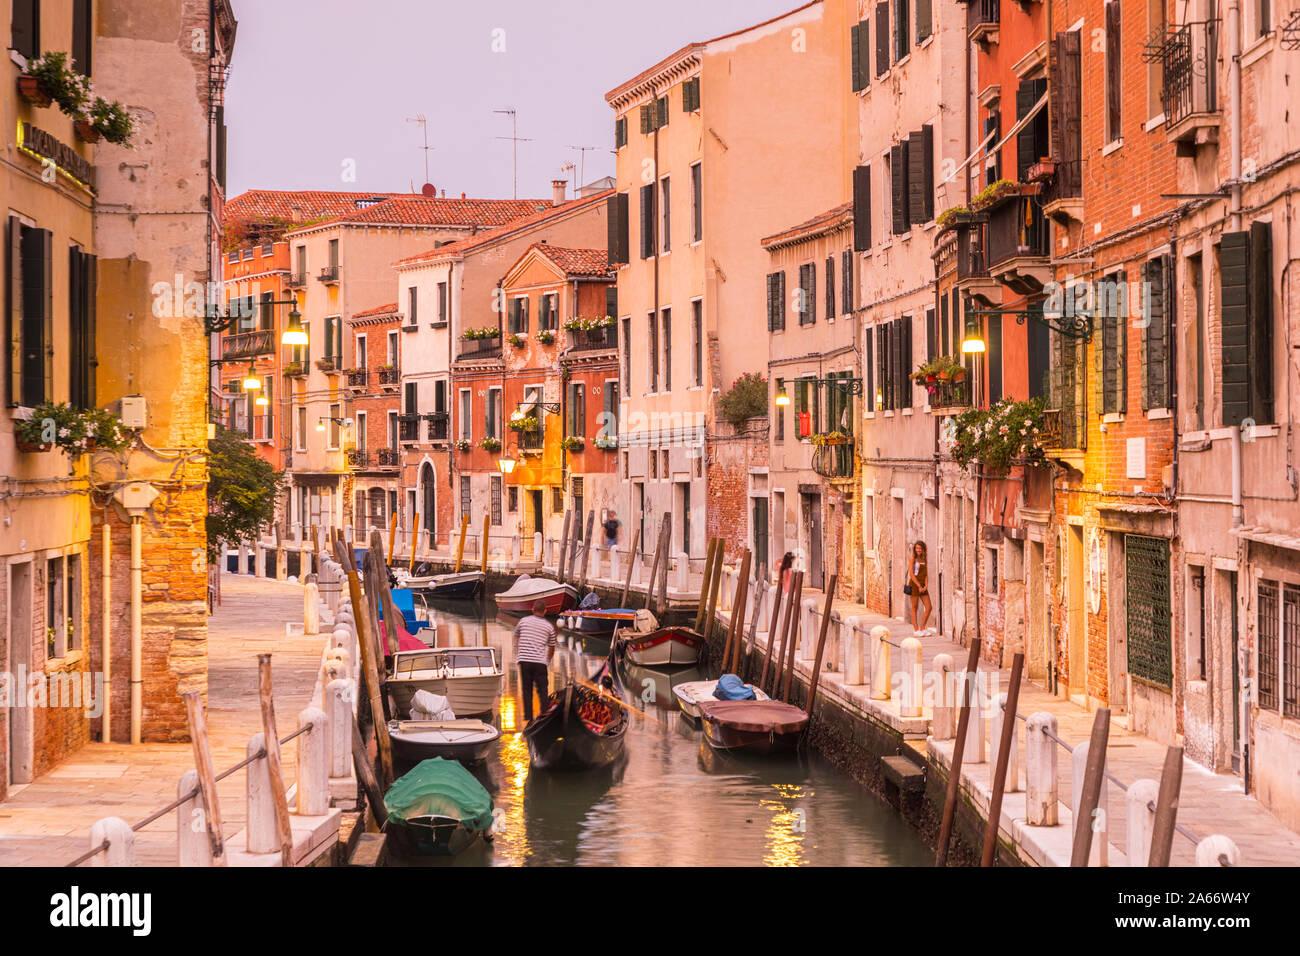 Dorsoduro, Venecia, Véneto, Italia Foto de stock